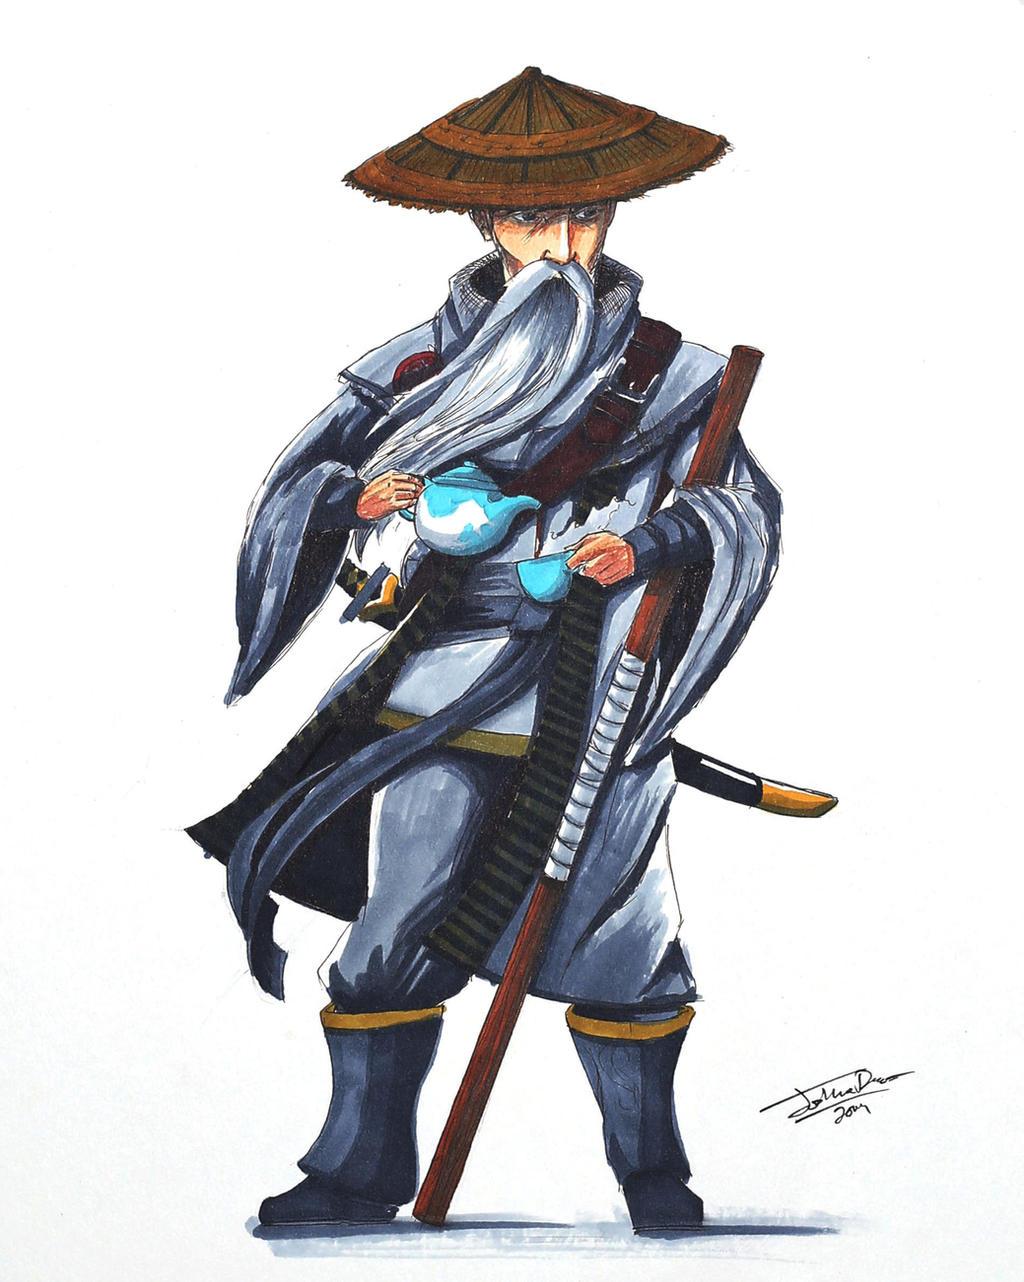 Sensei wu ninjago by joshuad17 on deviantart - Sensei ninjago ...